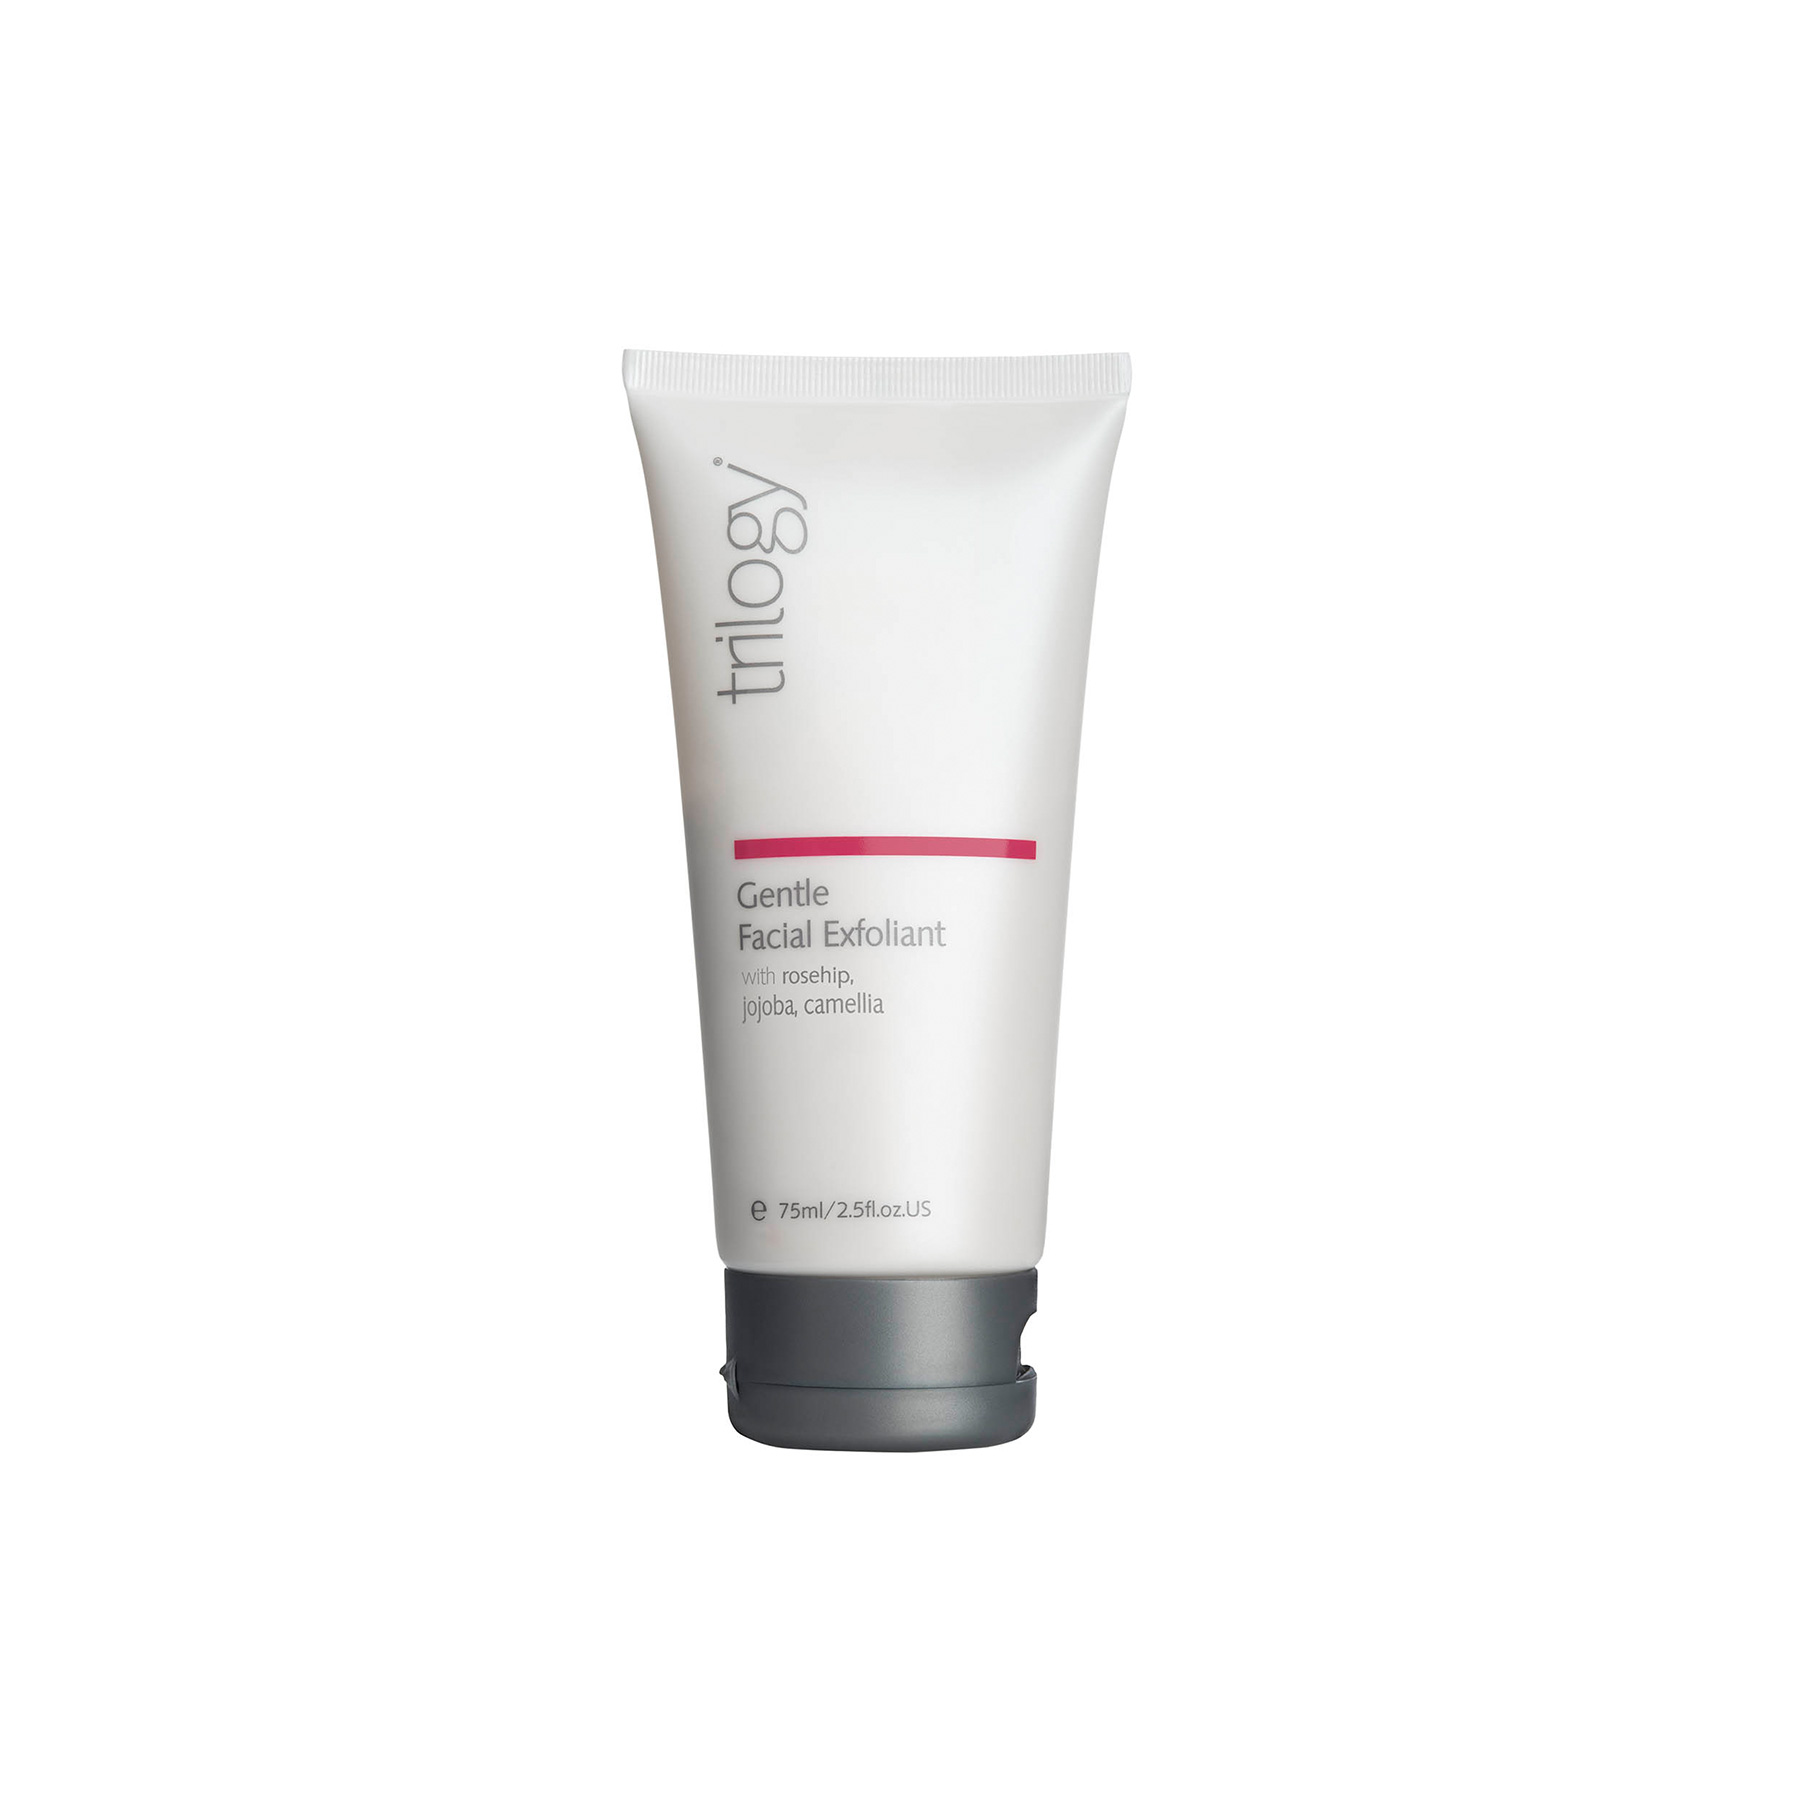 Gentle Facial Exfoliant • $39   Gentle exfoliant  Jojoba wax spheres take away surface buildup. Smooths rough areas.